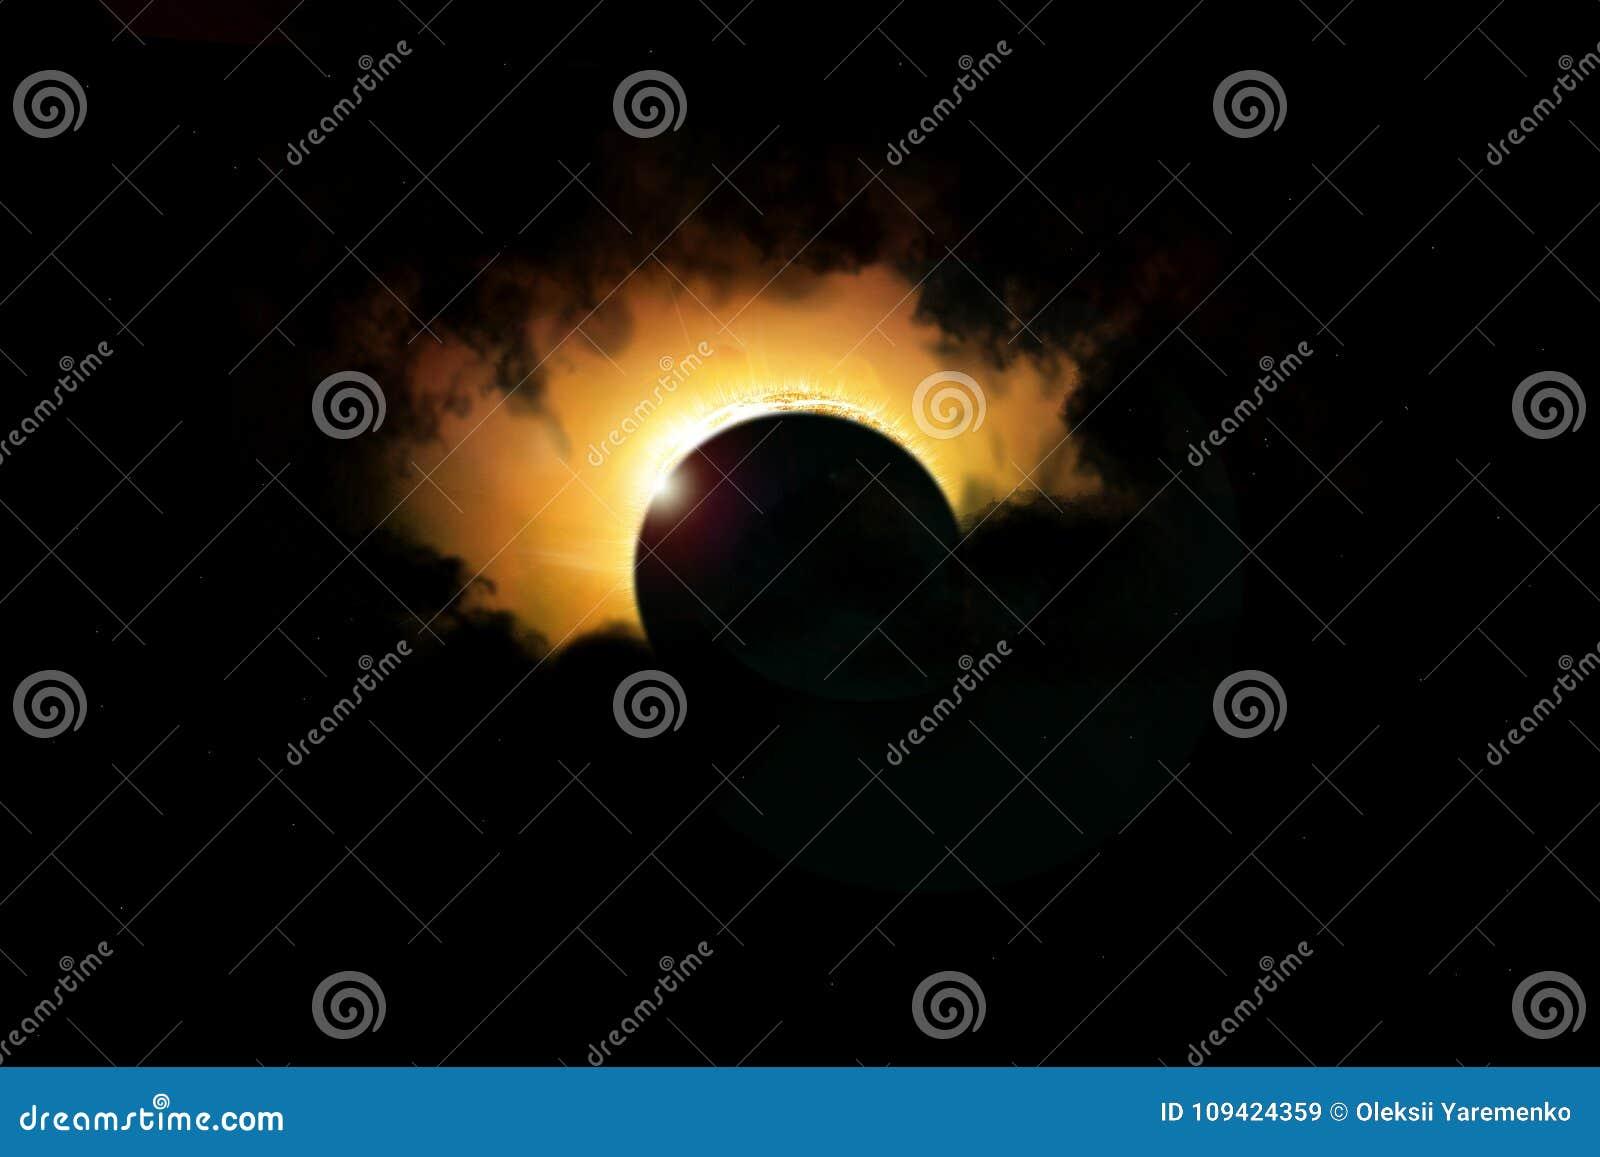 Eclipse solar del espacio Sistema Solar, llamarada solar, eclipse total